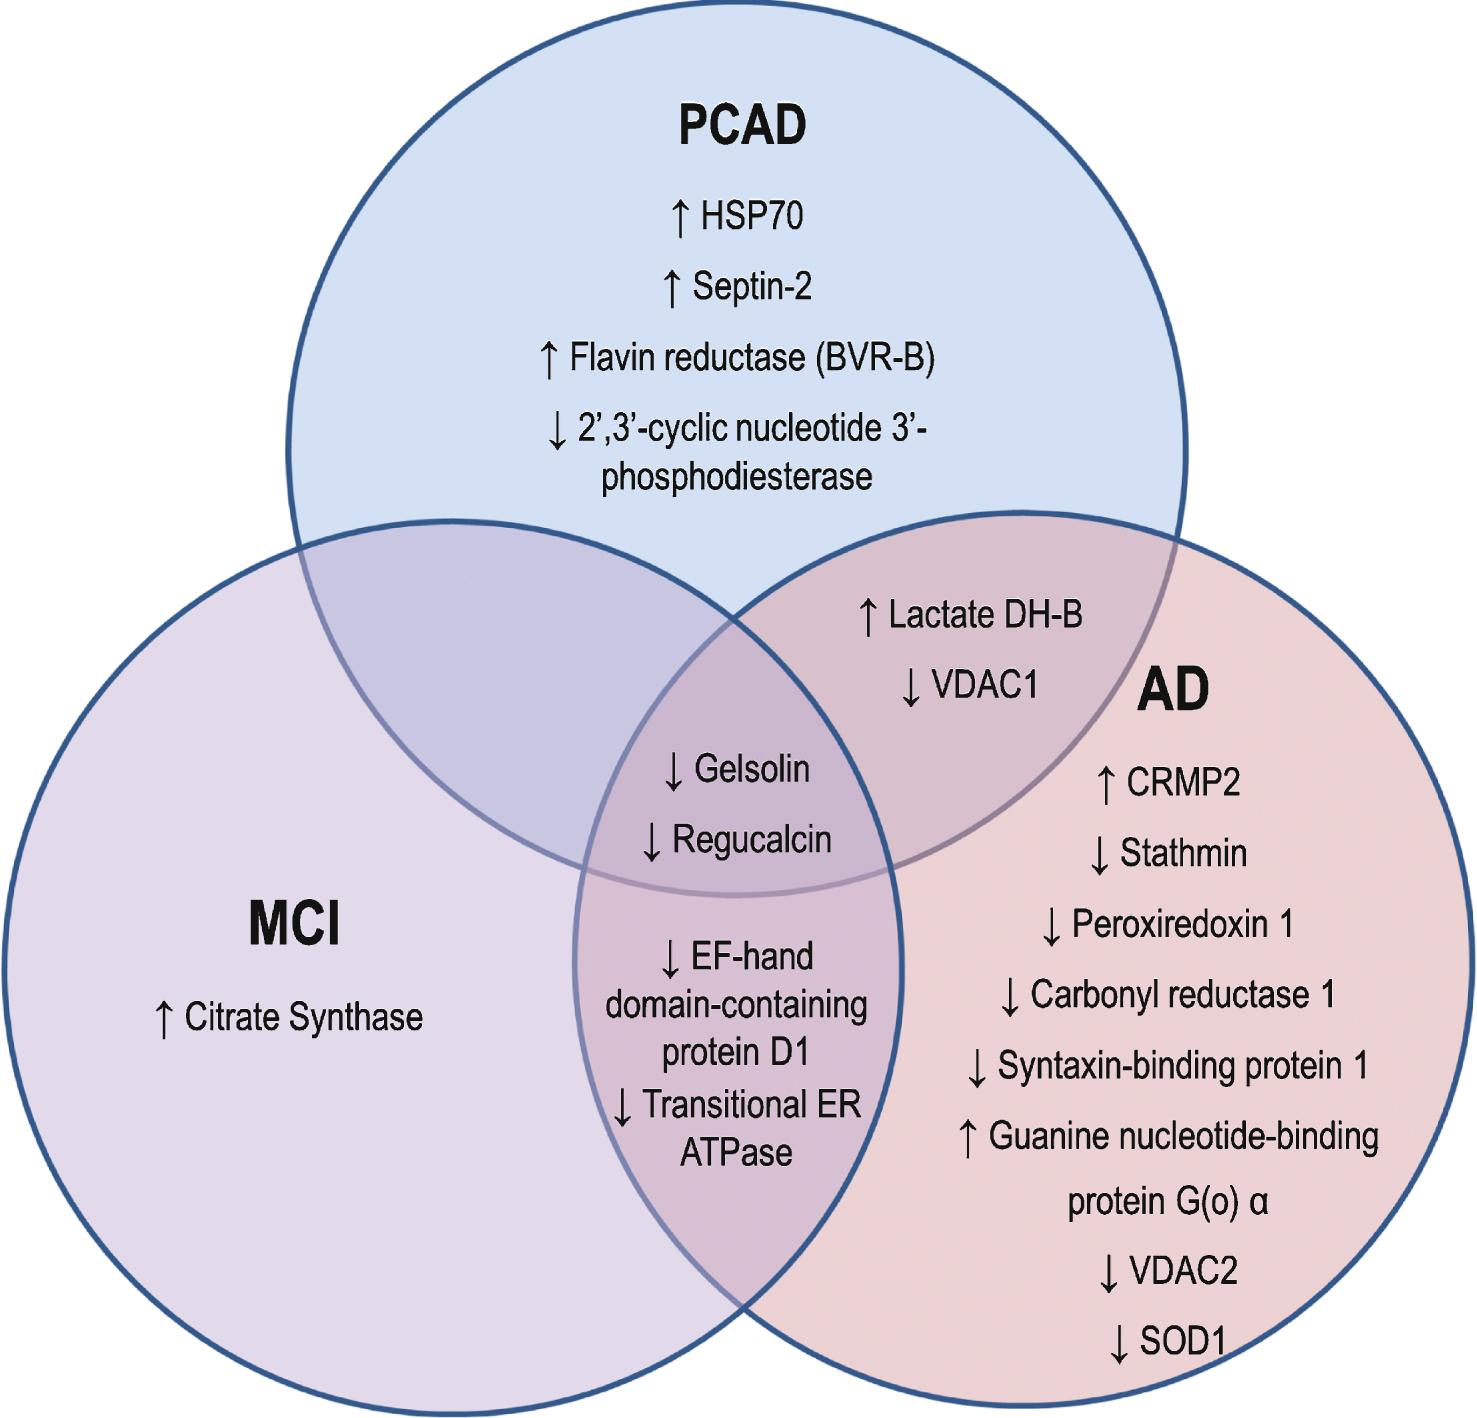 Endocytosis and exocytosis venn diagram vatozozdevelopment endocytosis ccuart Gallery